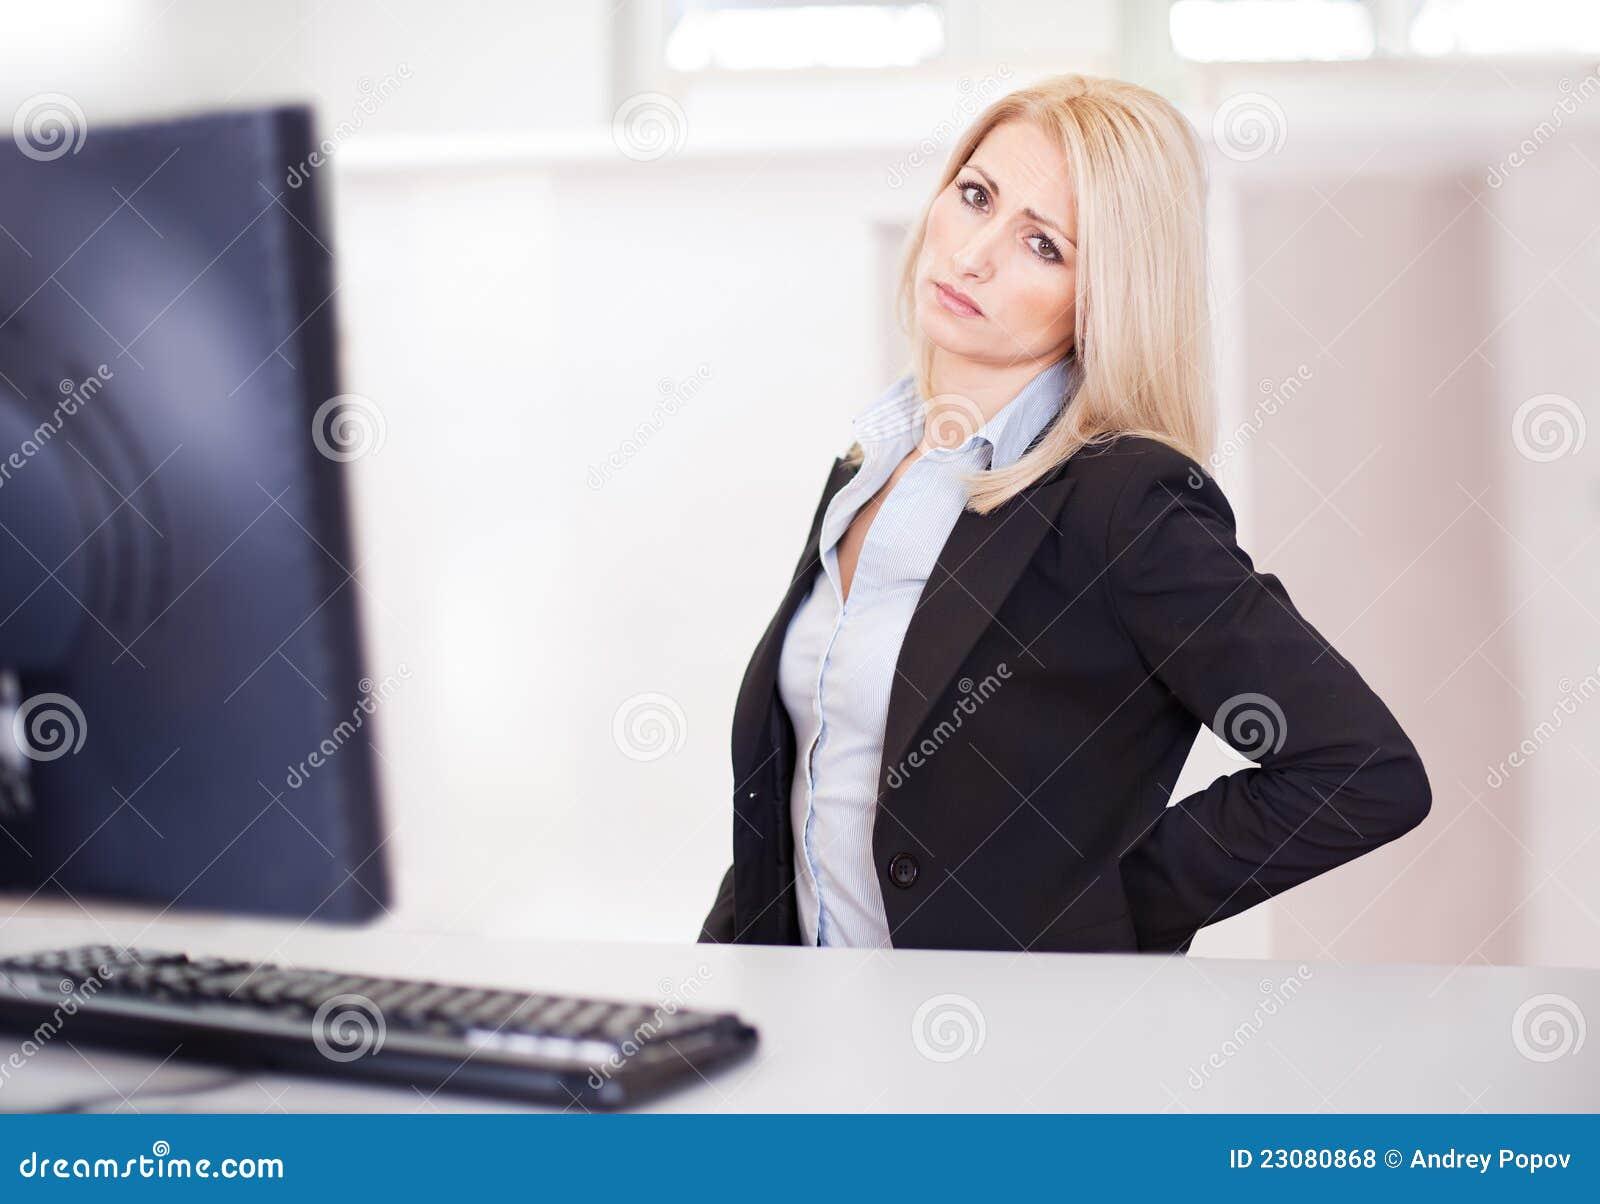 Business women having back pain royalty free stock photos image